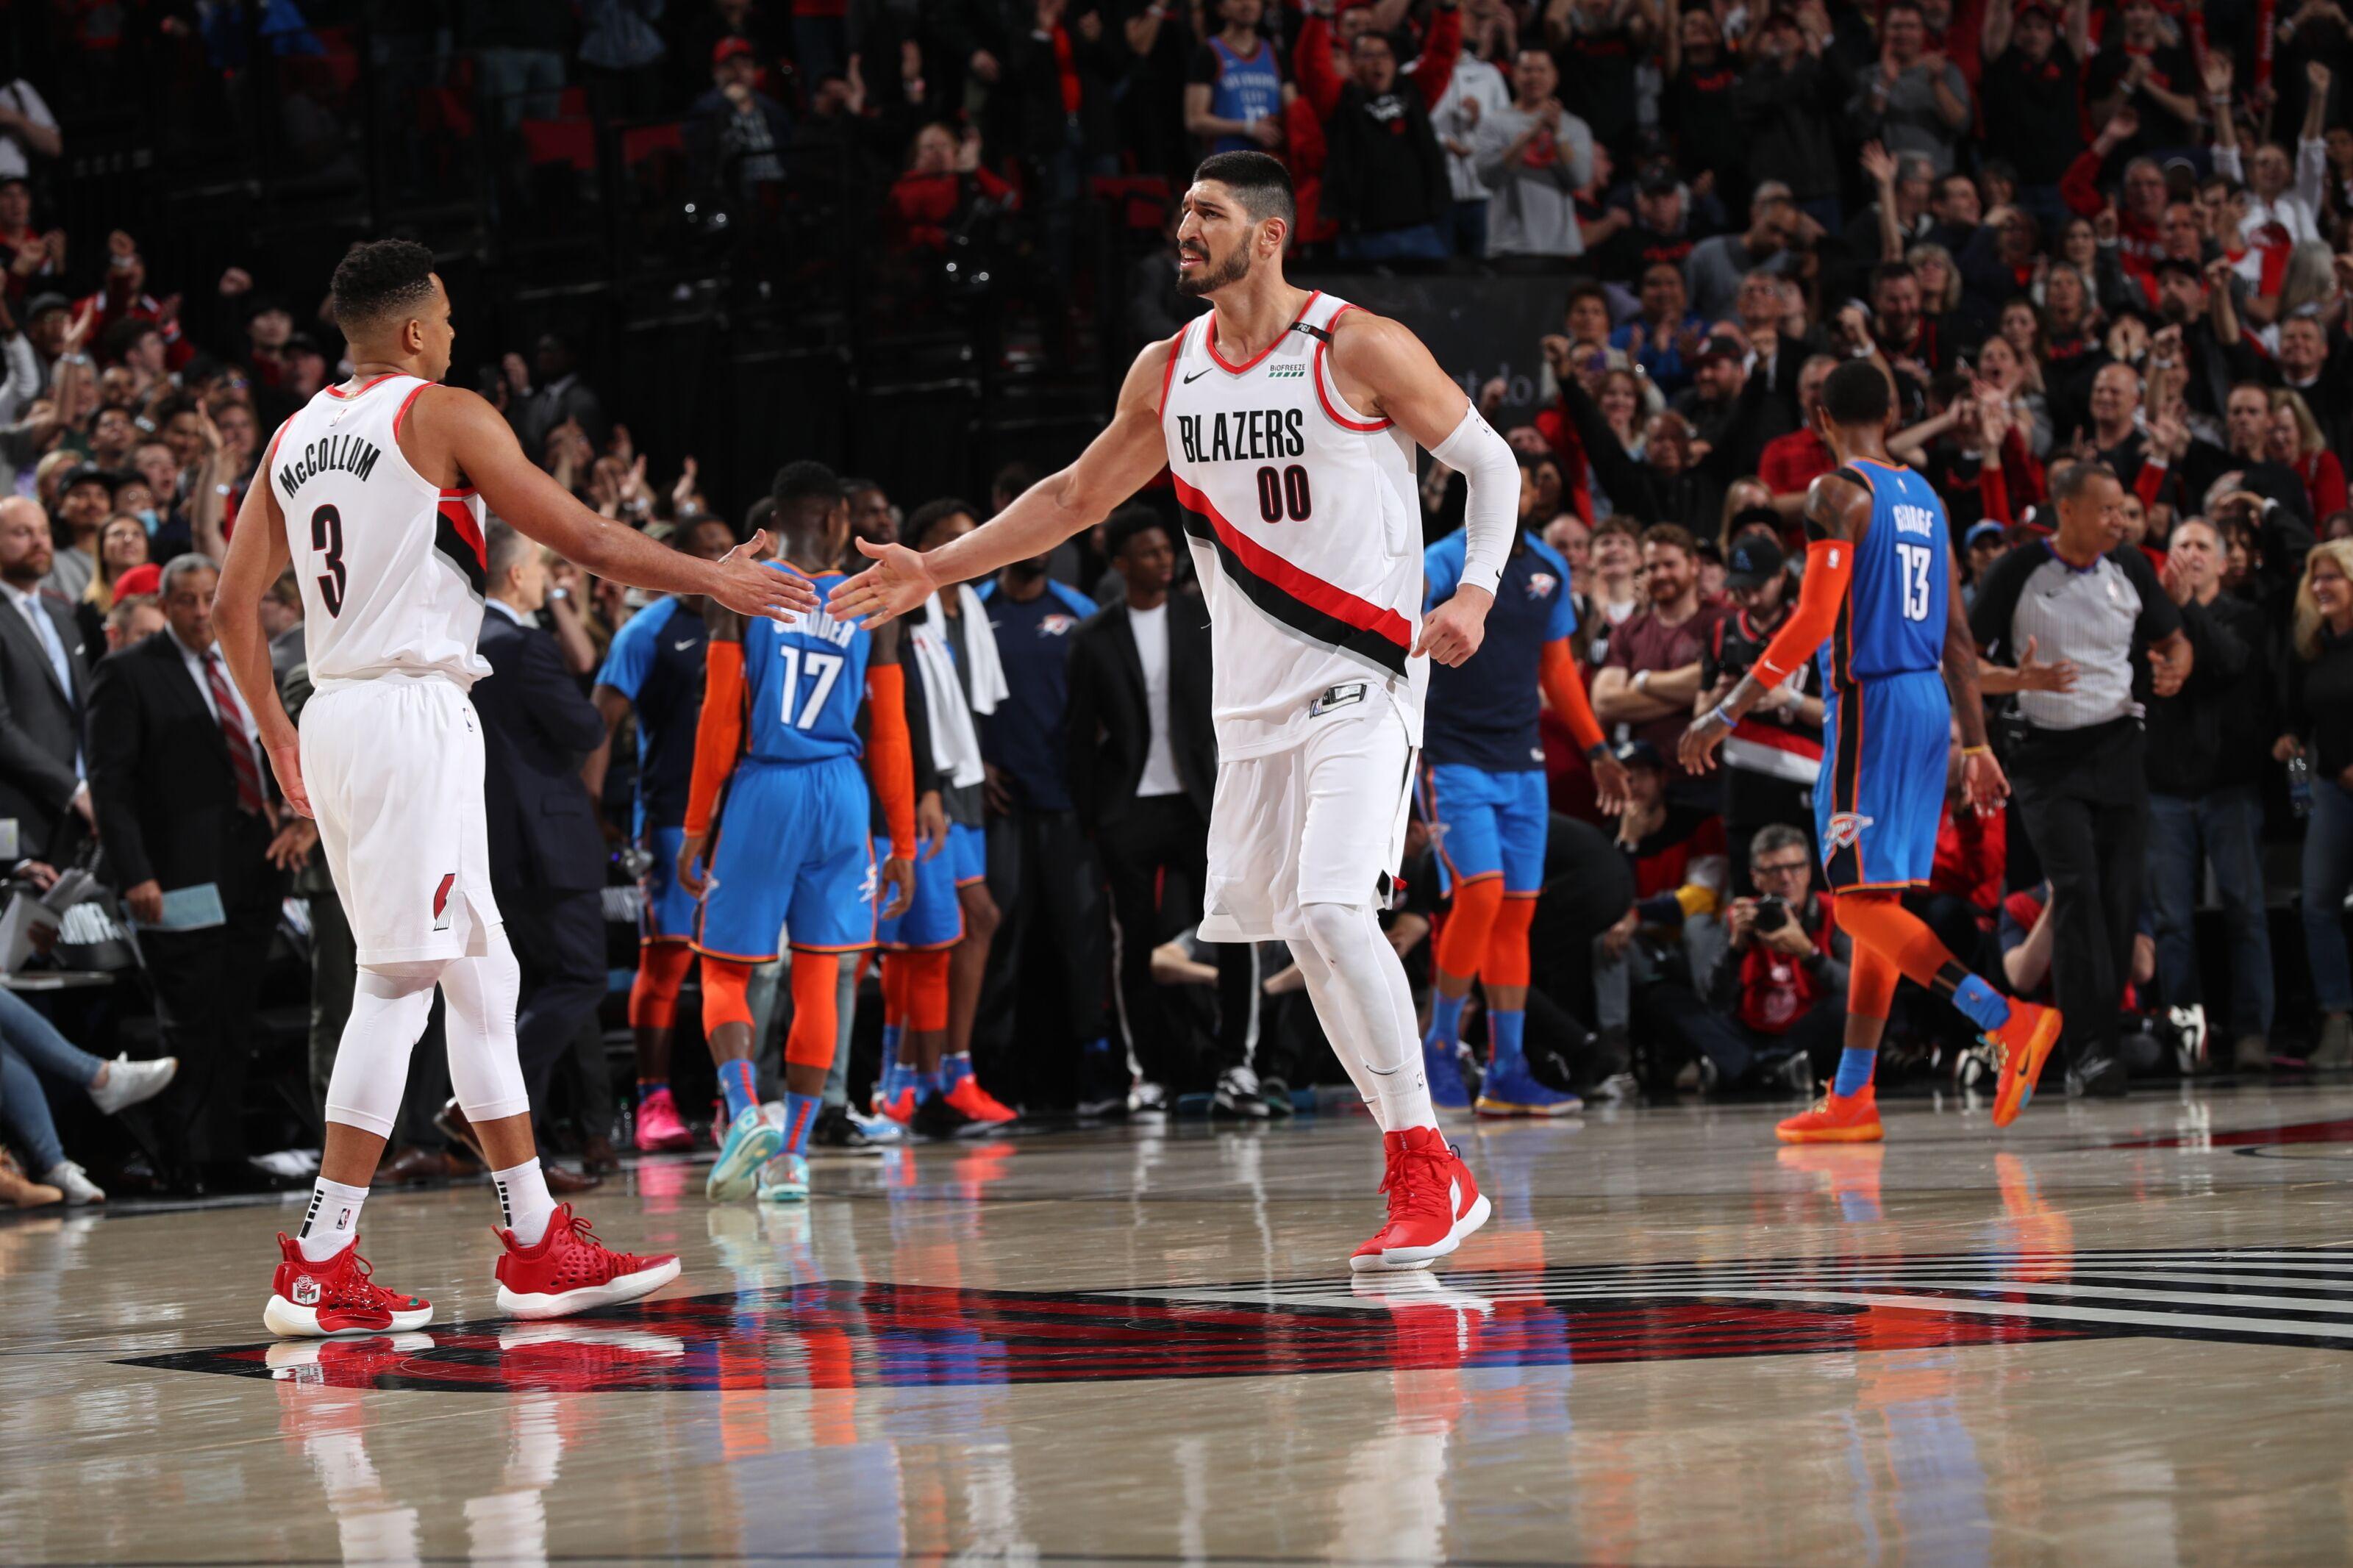 New York Knicks: New York Knicks: Enes Kanter Takes Predictable Shot Amid